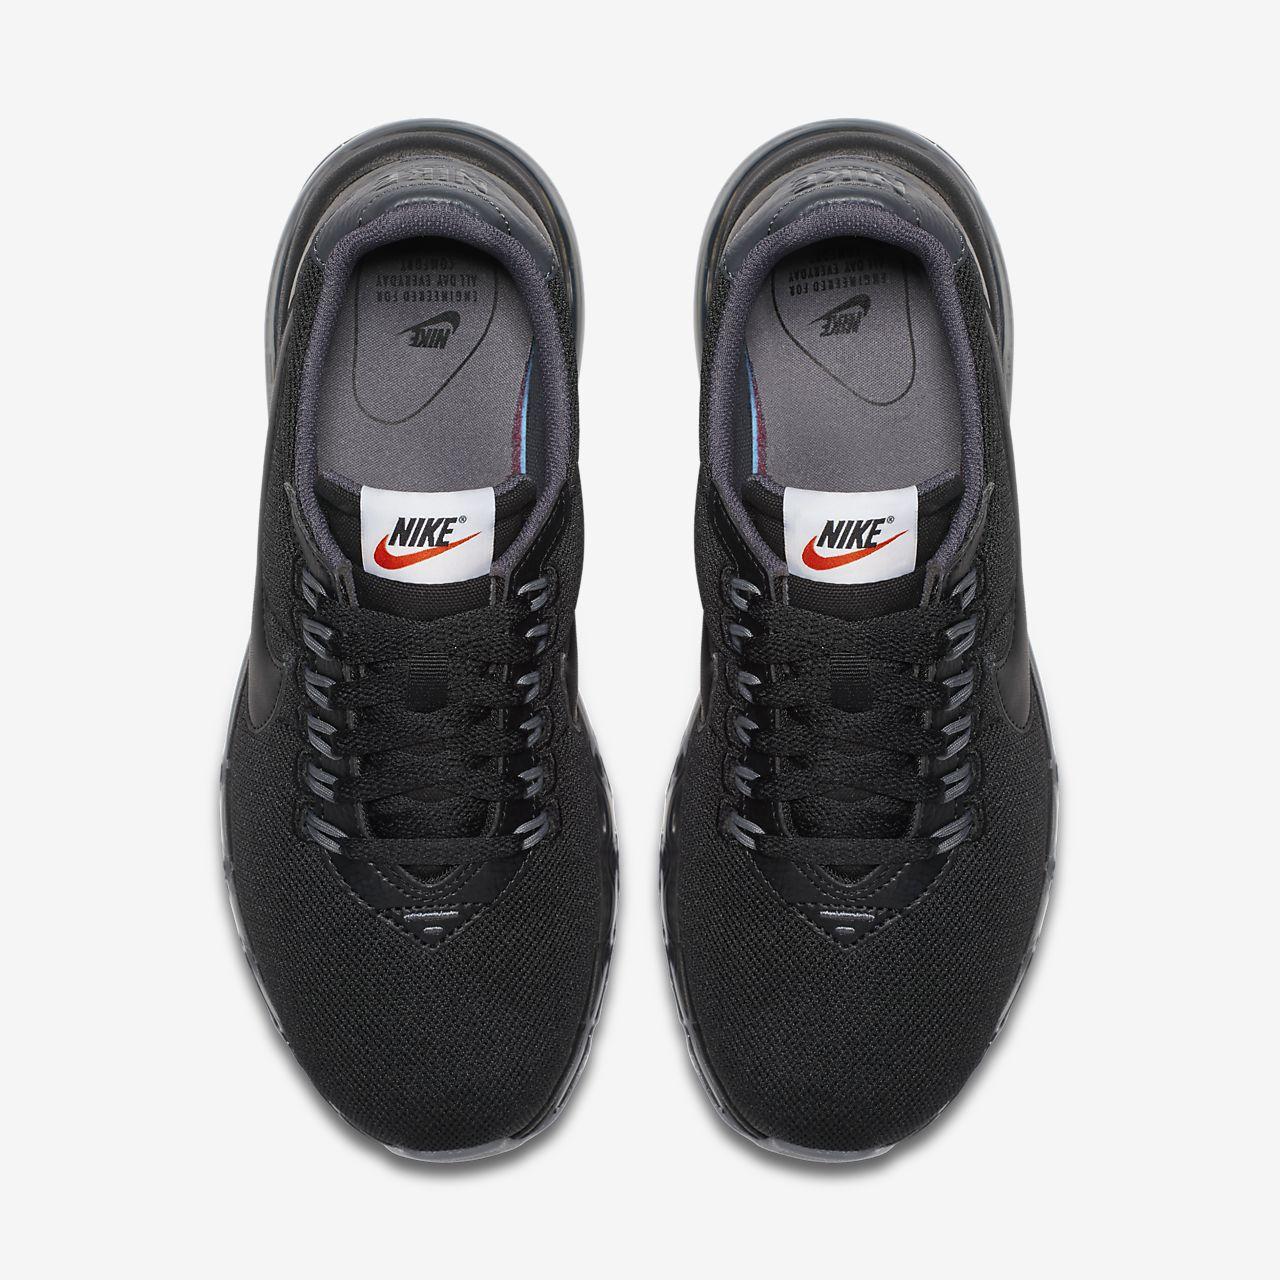 online retailer bf134 5b0df ... Nike Air Max LD-Zero Womens Shoe